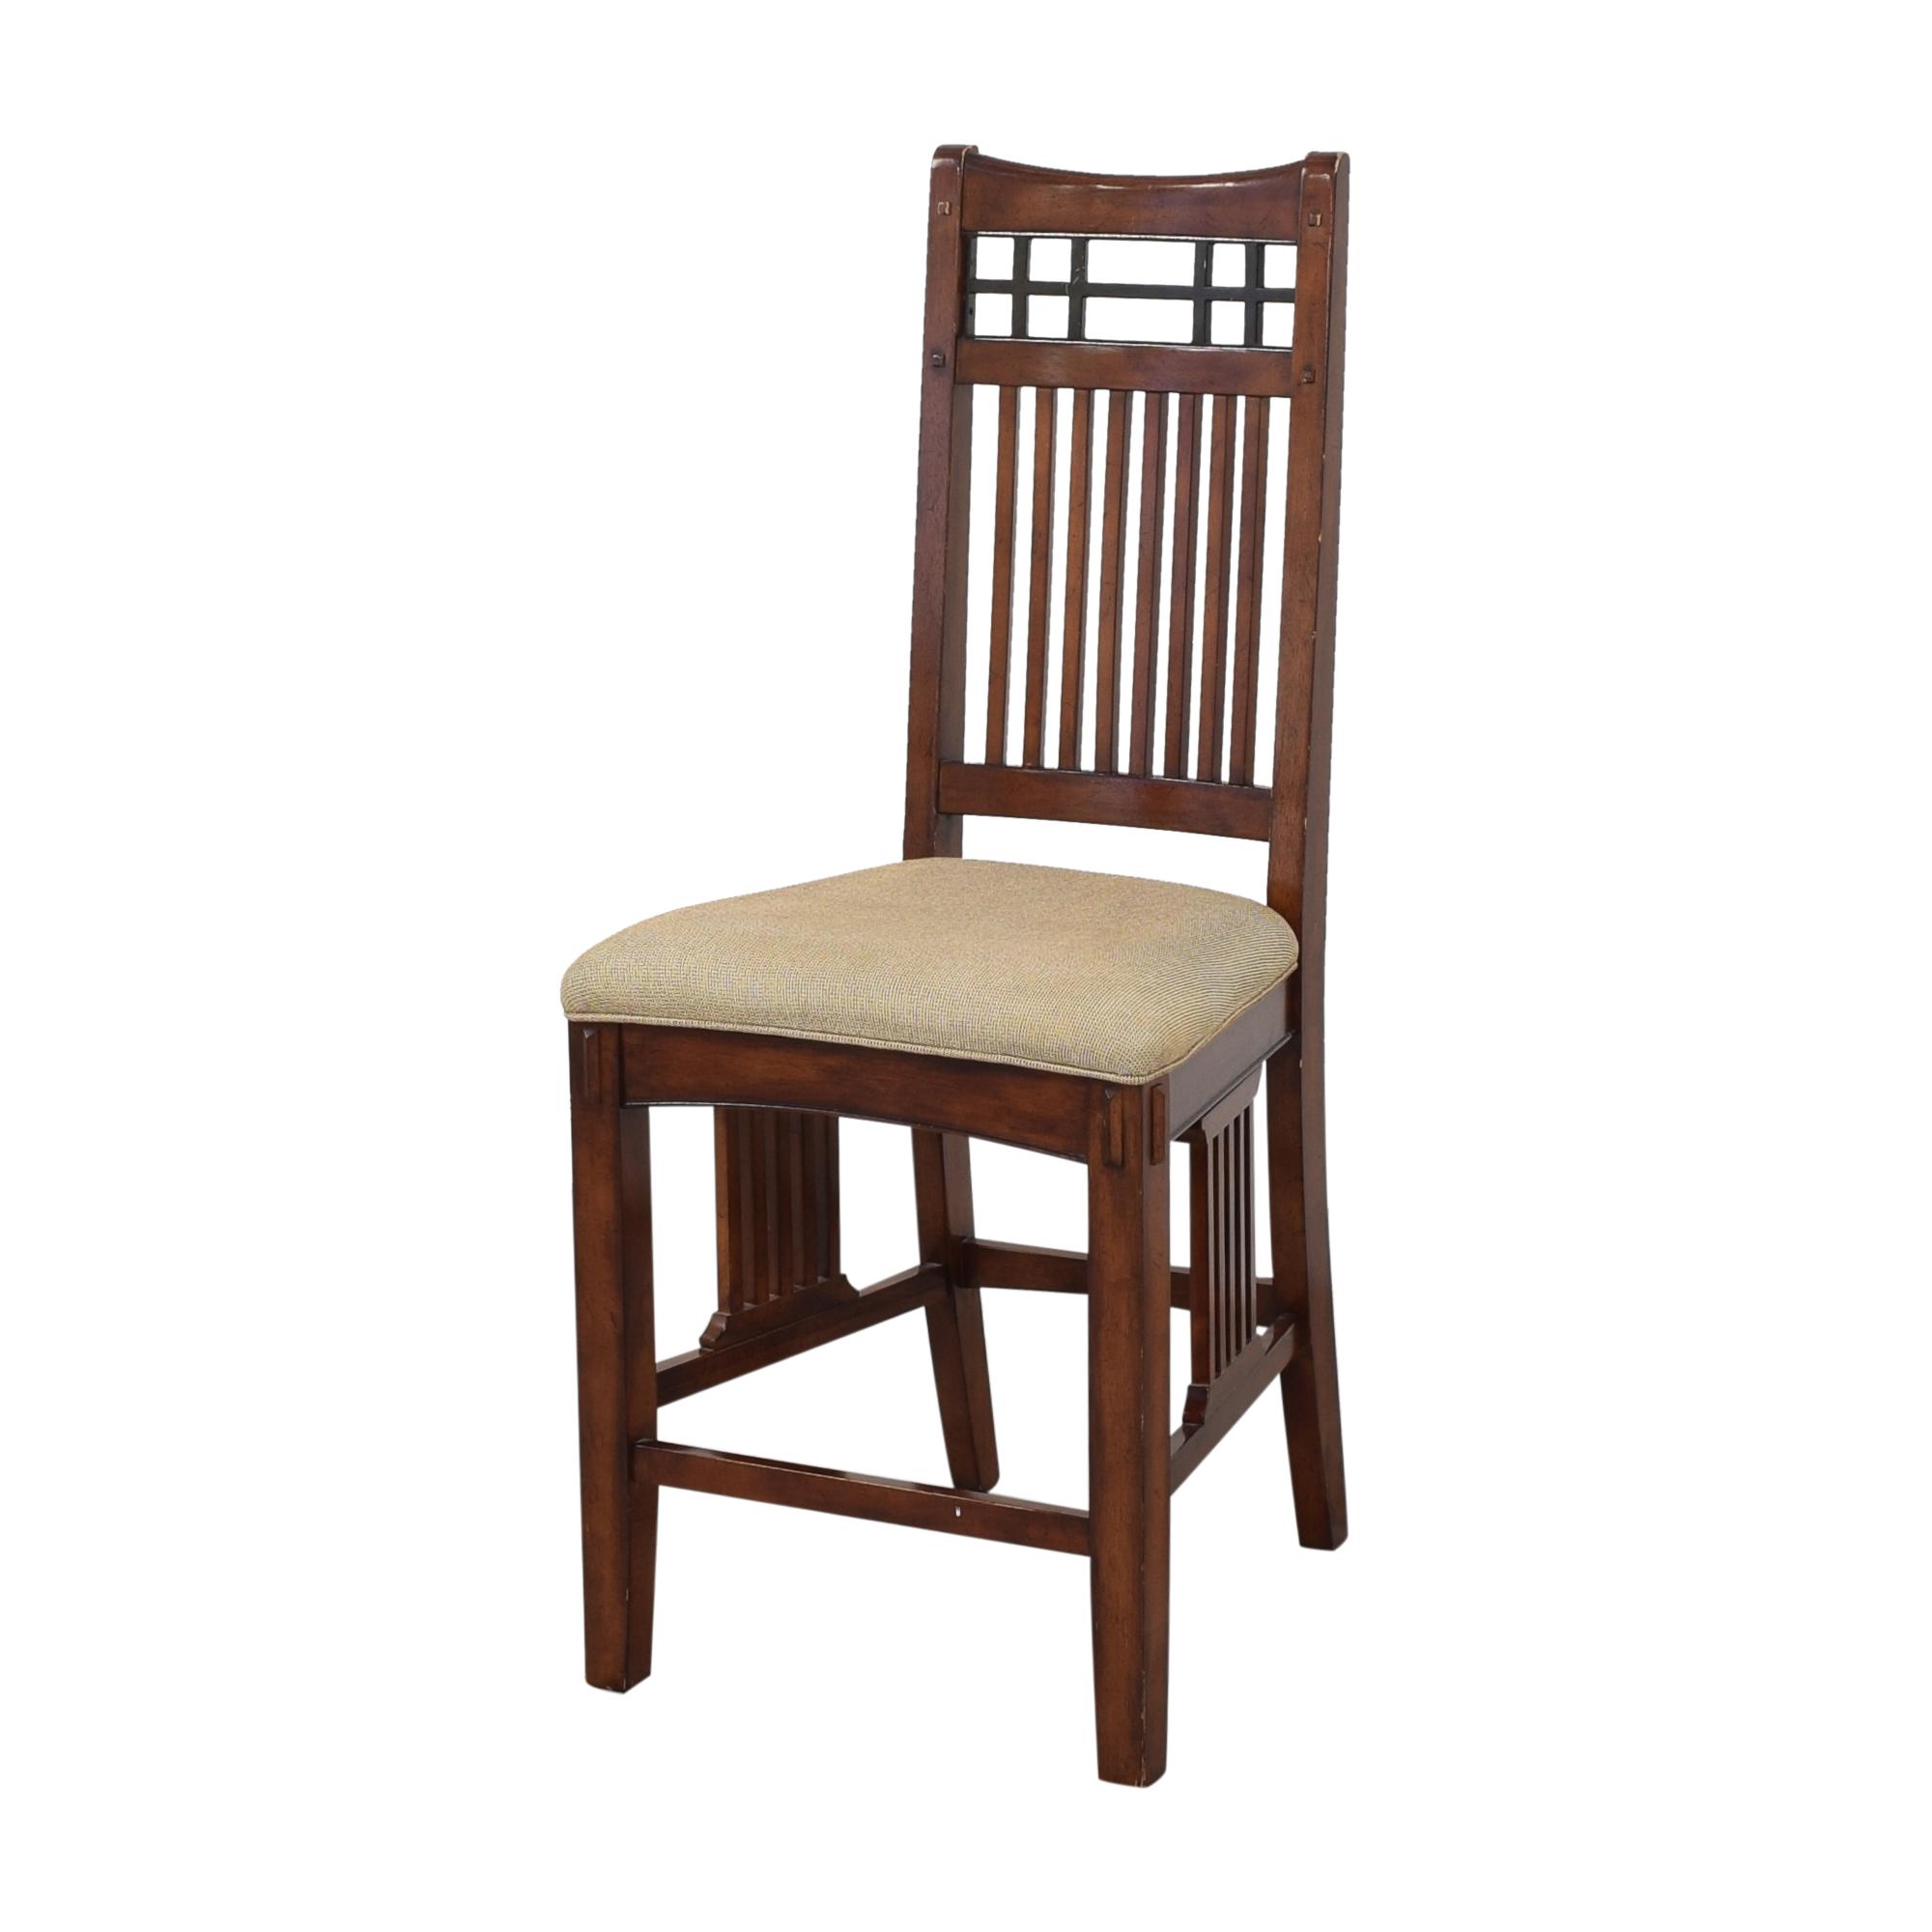 Broyhill Furniture Broyhill Vantana Upholstered Chairs discount